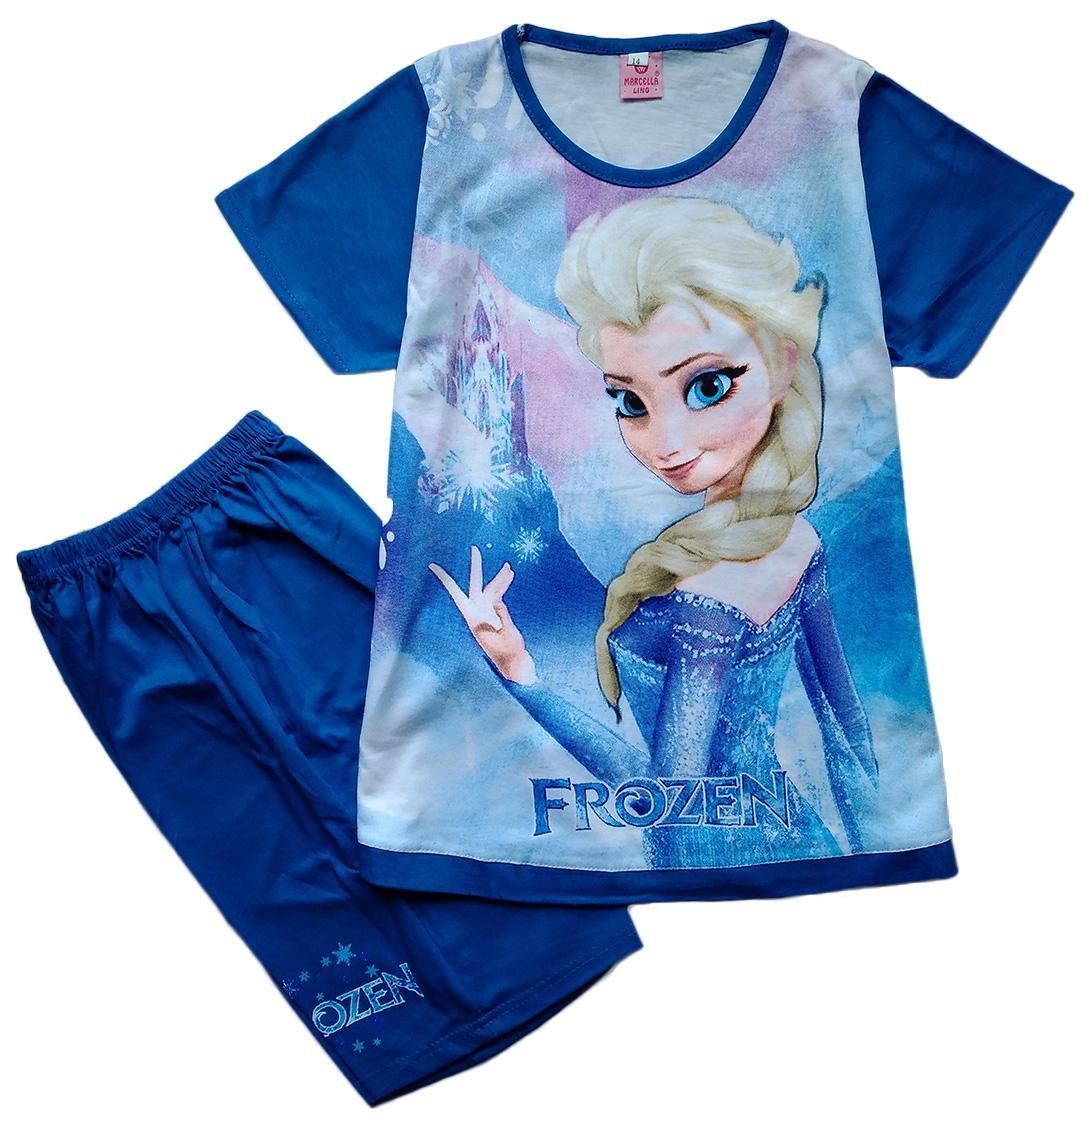 Baju Setelan Anak Perempuan Frozen FR112017